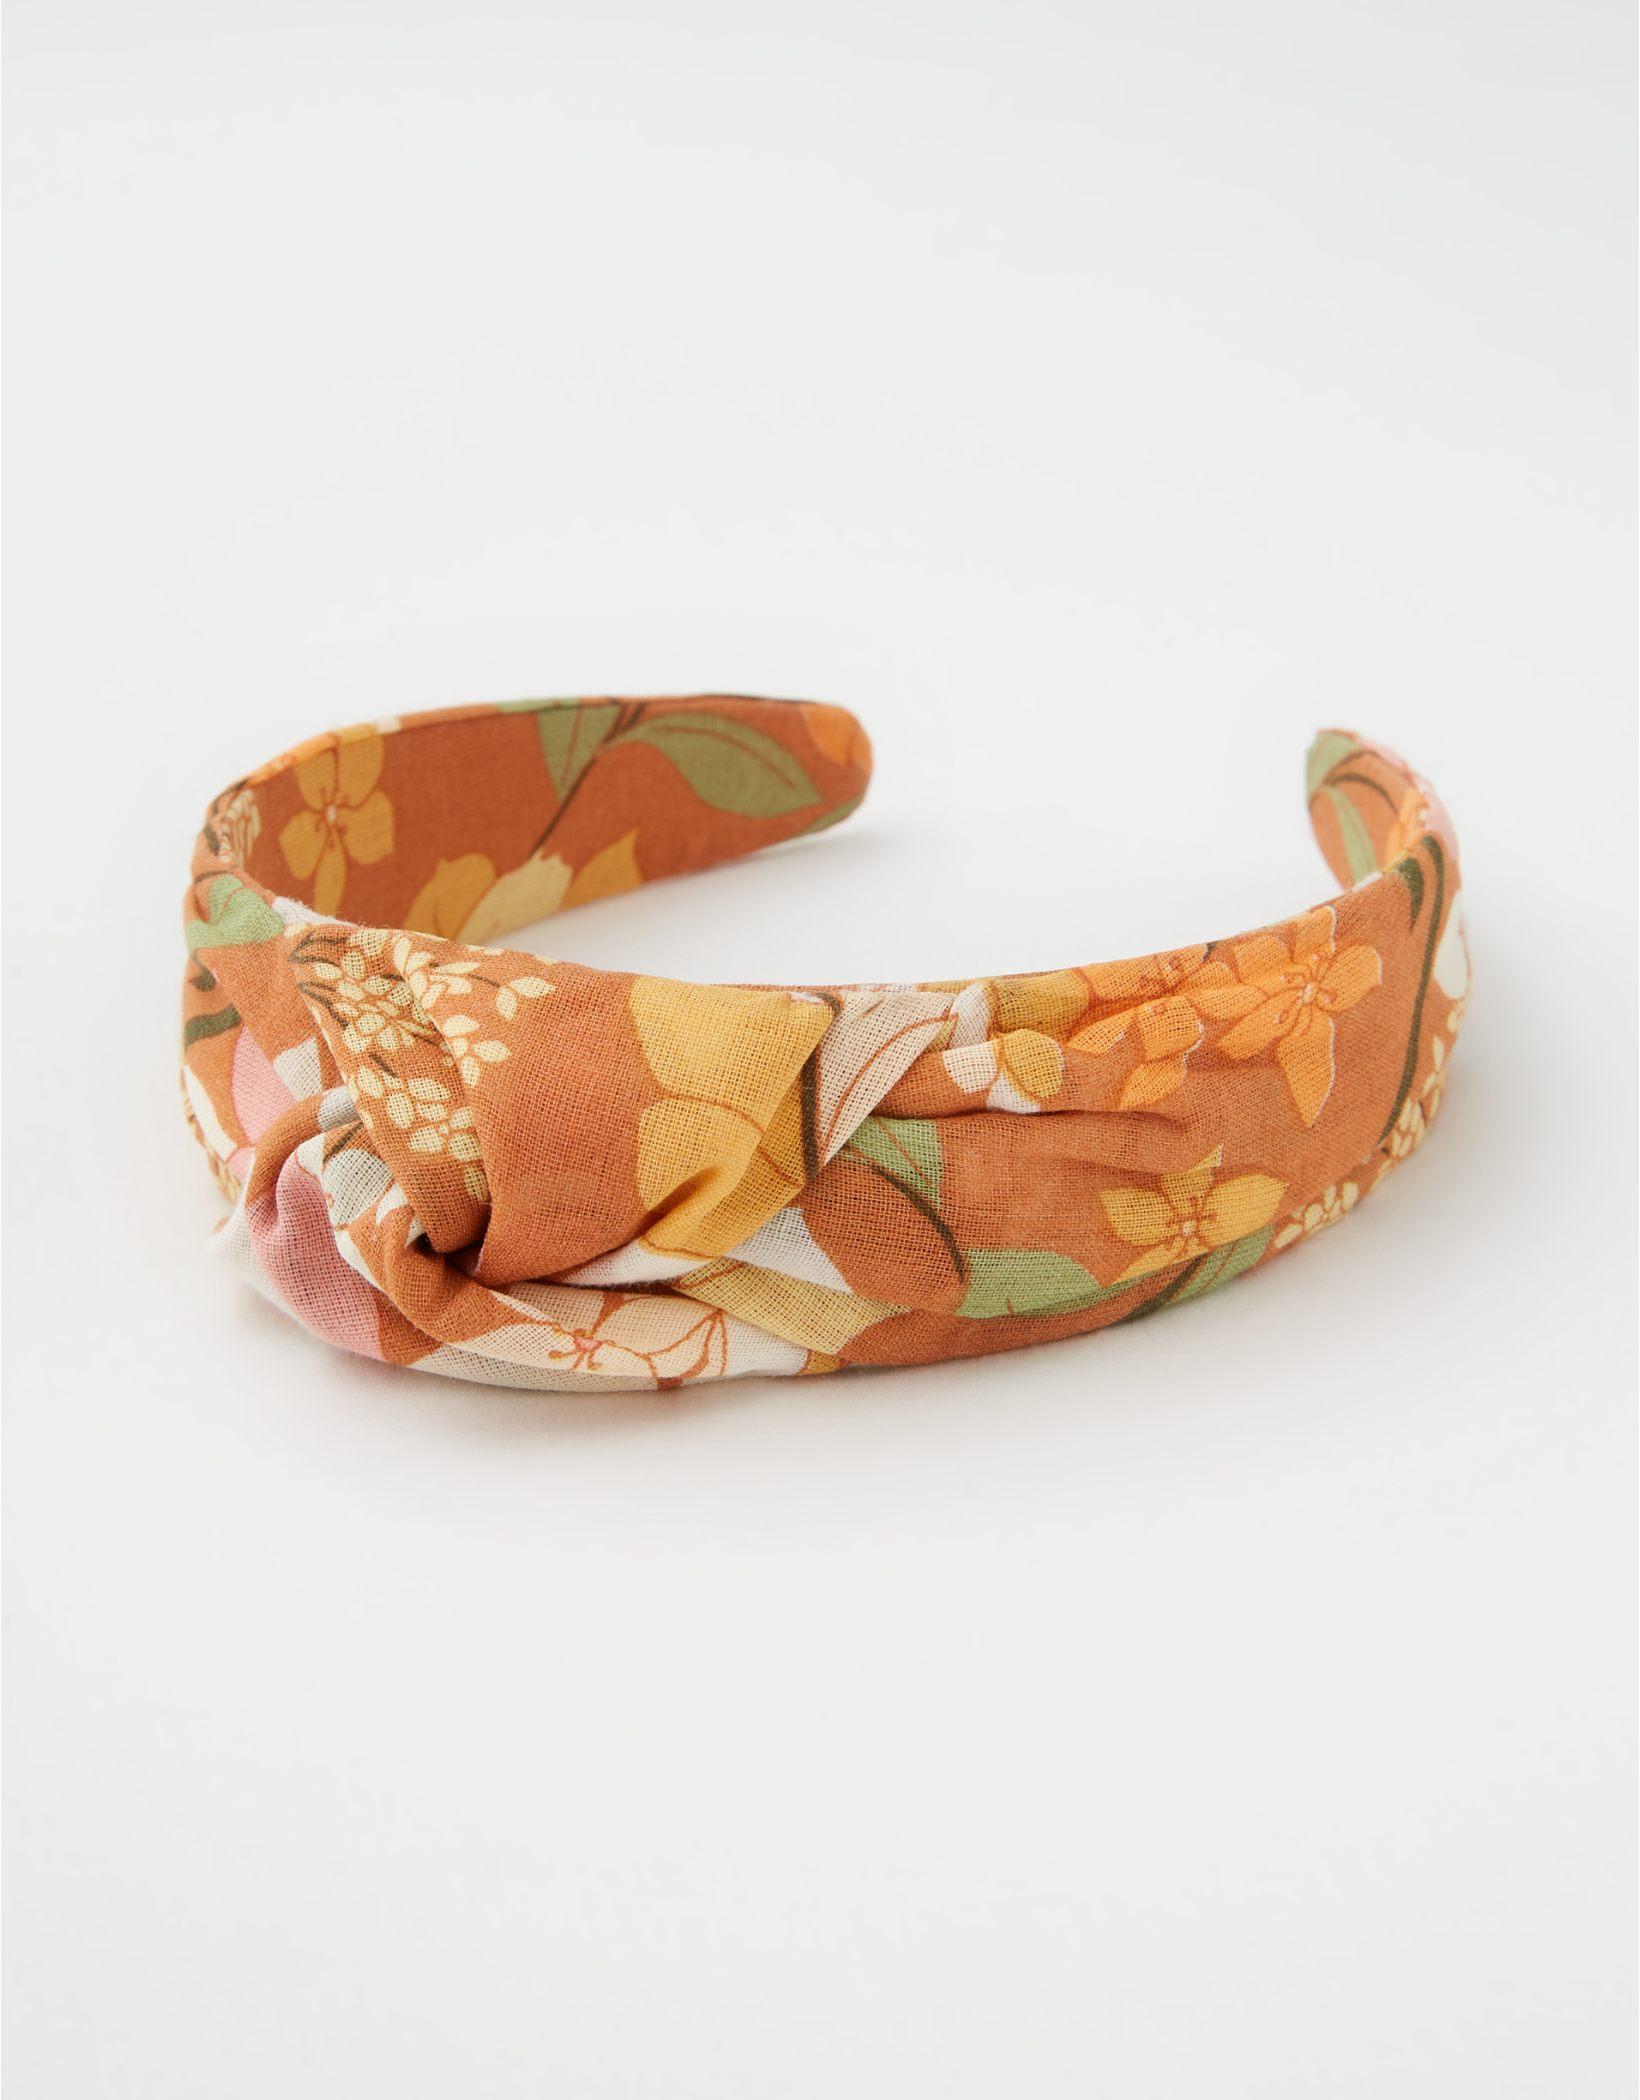 Aerie Top Knot Headband